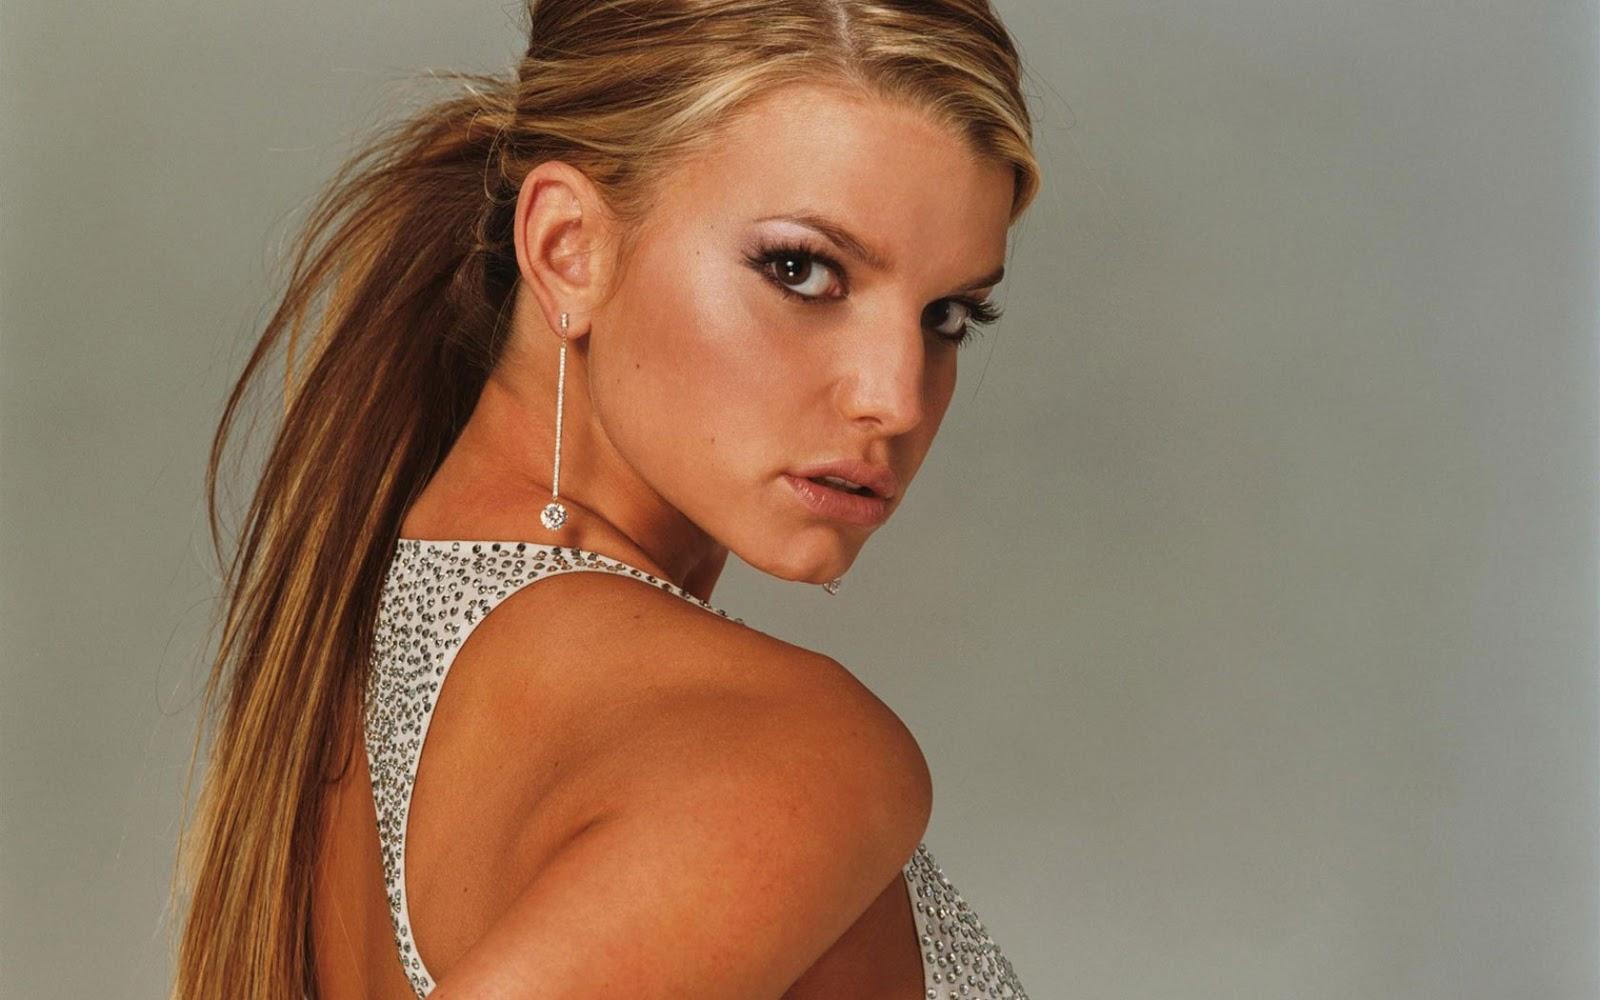 http://4.bp.blogspot.com/-iJdB30KNaeg/UNDiwzeyUcI/AAAAAAAAUmI/uGlEd0Te6GA/s1600/Jessica-Simpson1.jpg